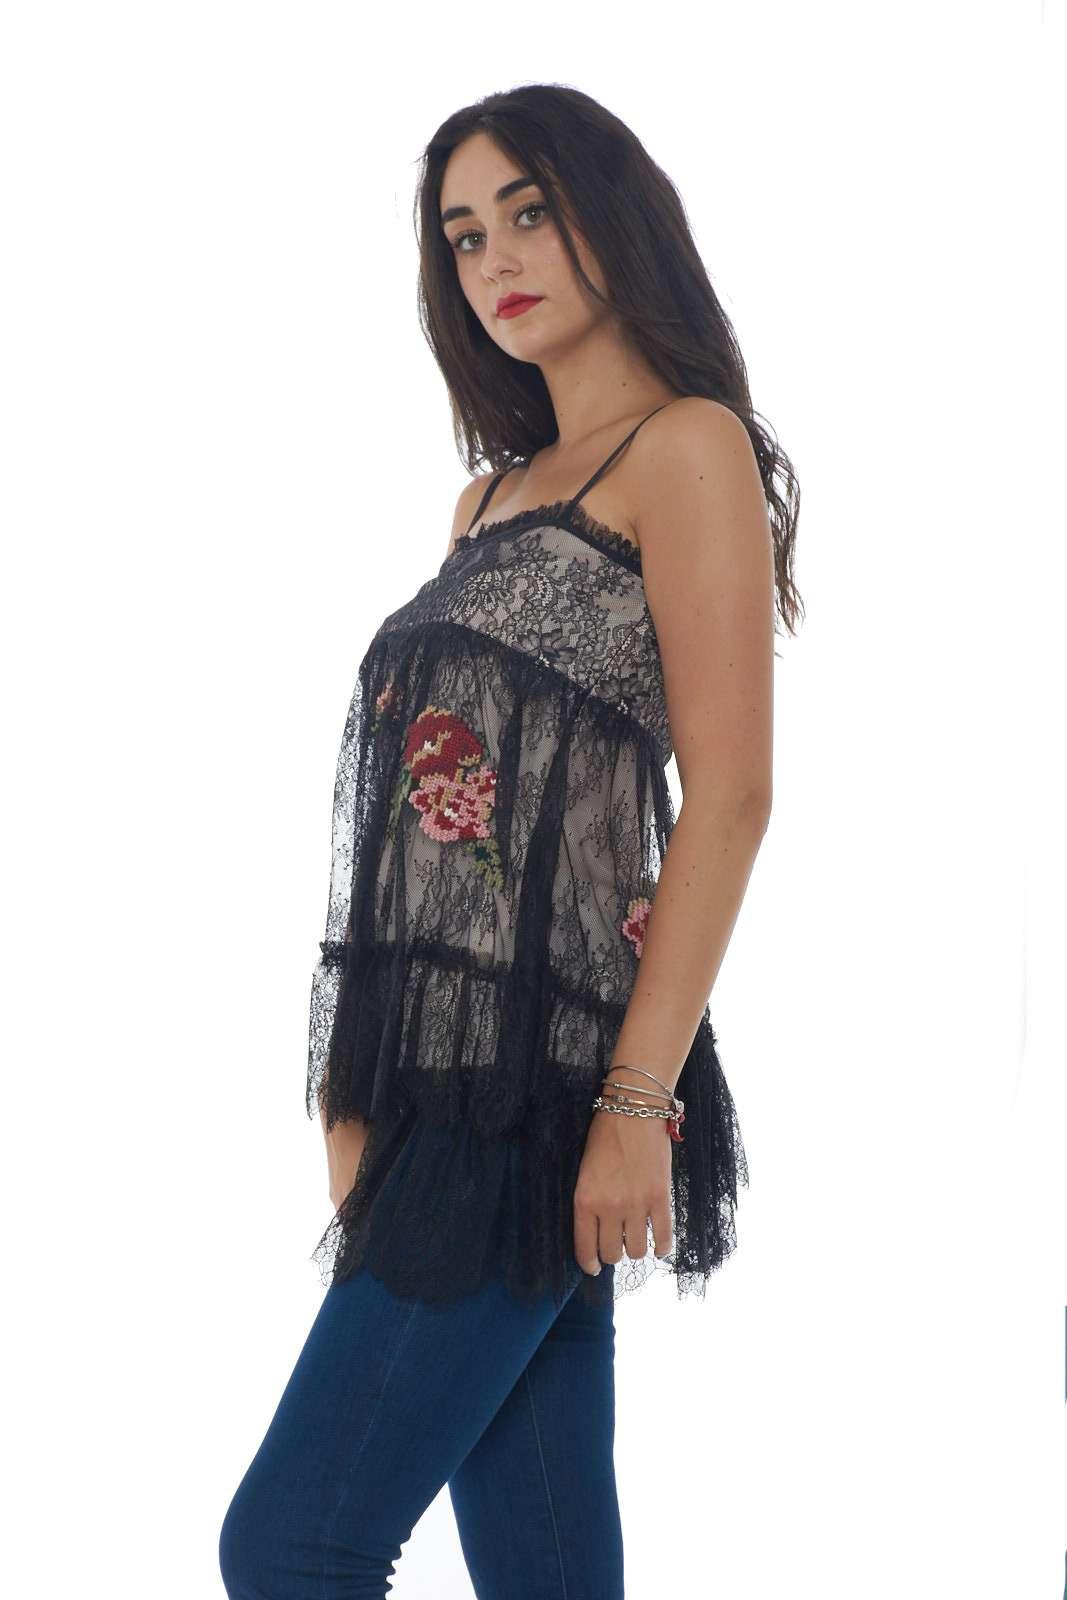 https://www.parmax.com/media/catalog/product/a/i/AI-outlet_parmax-top-donna-Twin-Set-192TP2588-B.jpg